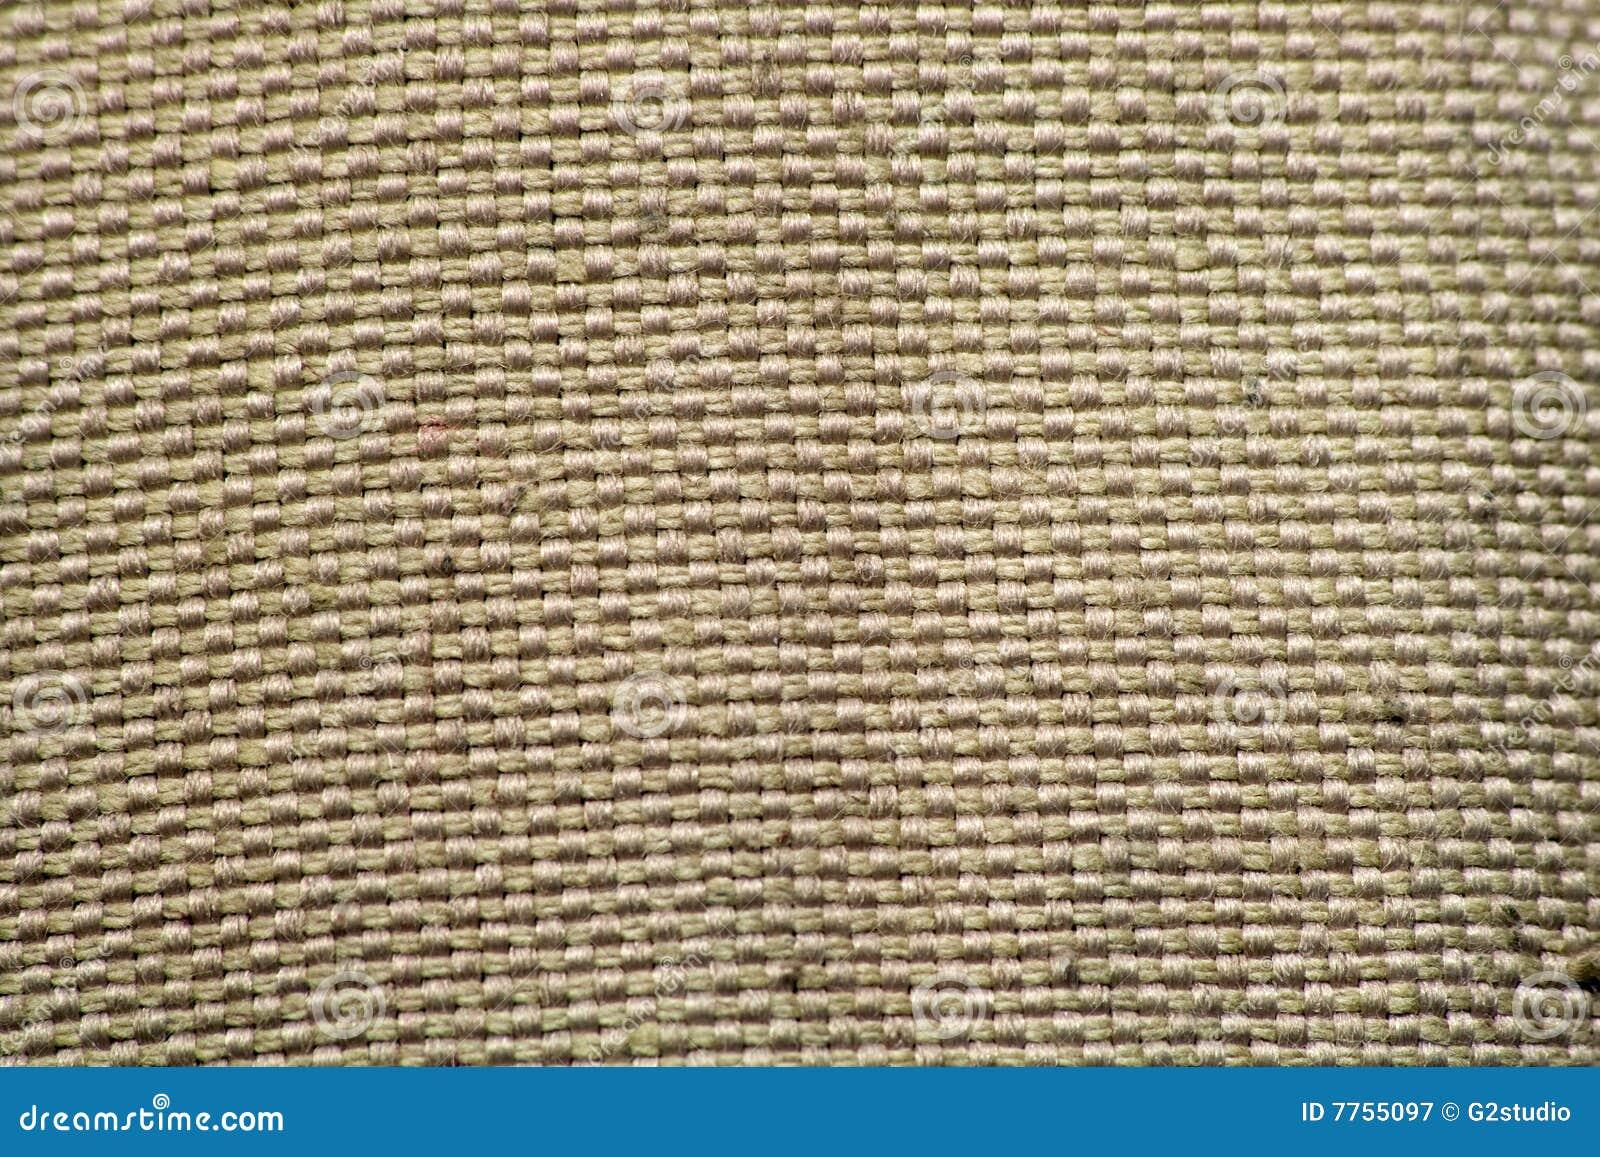 Hemp Fabric Texture Stock Image Image Of Manufactured